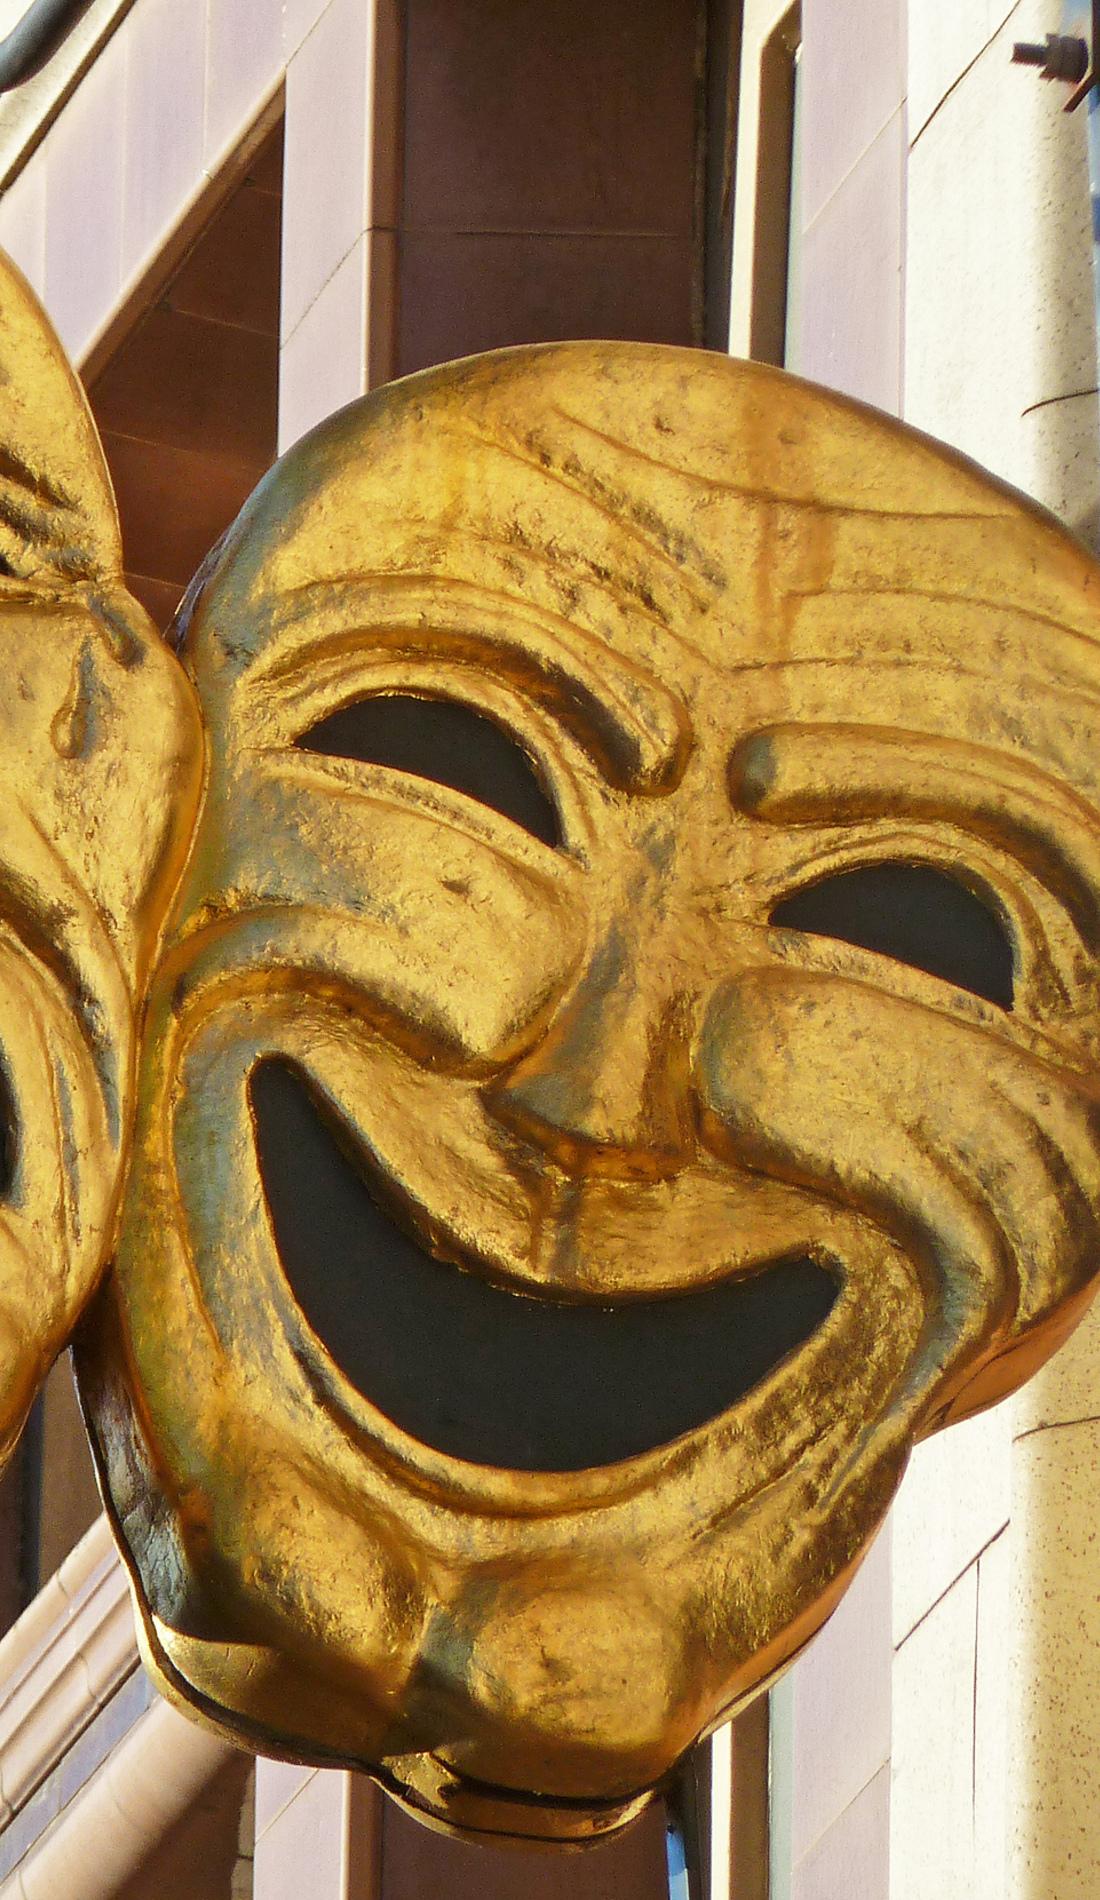 A Festival of Laughs live event